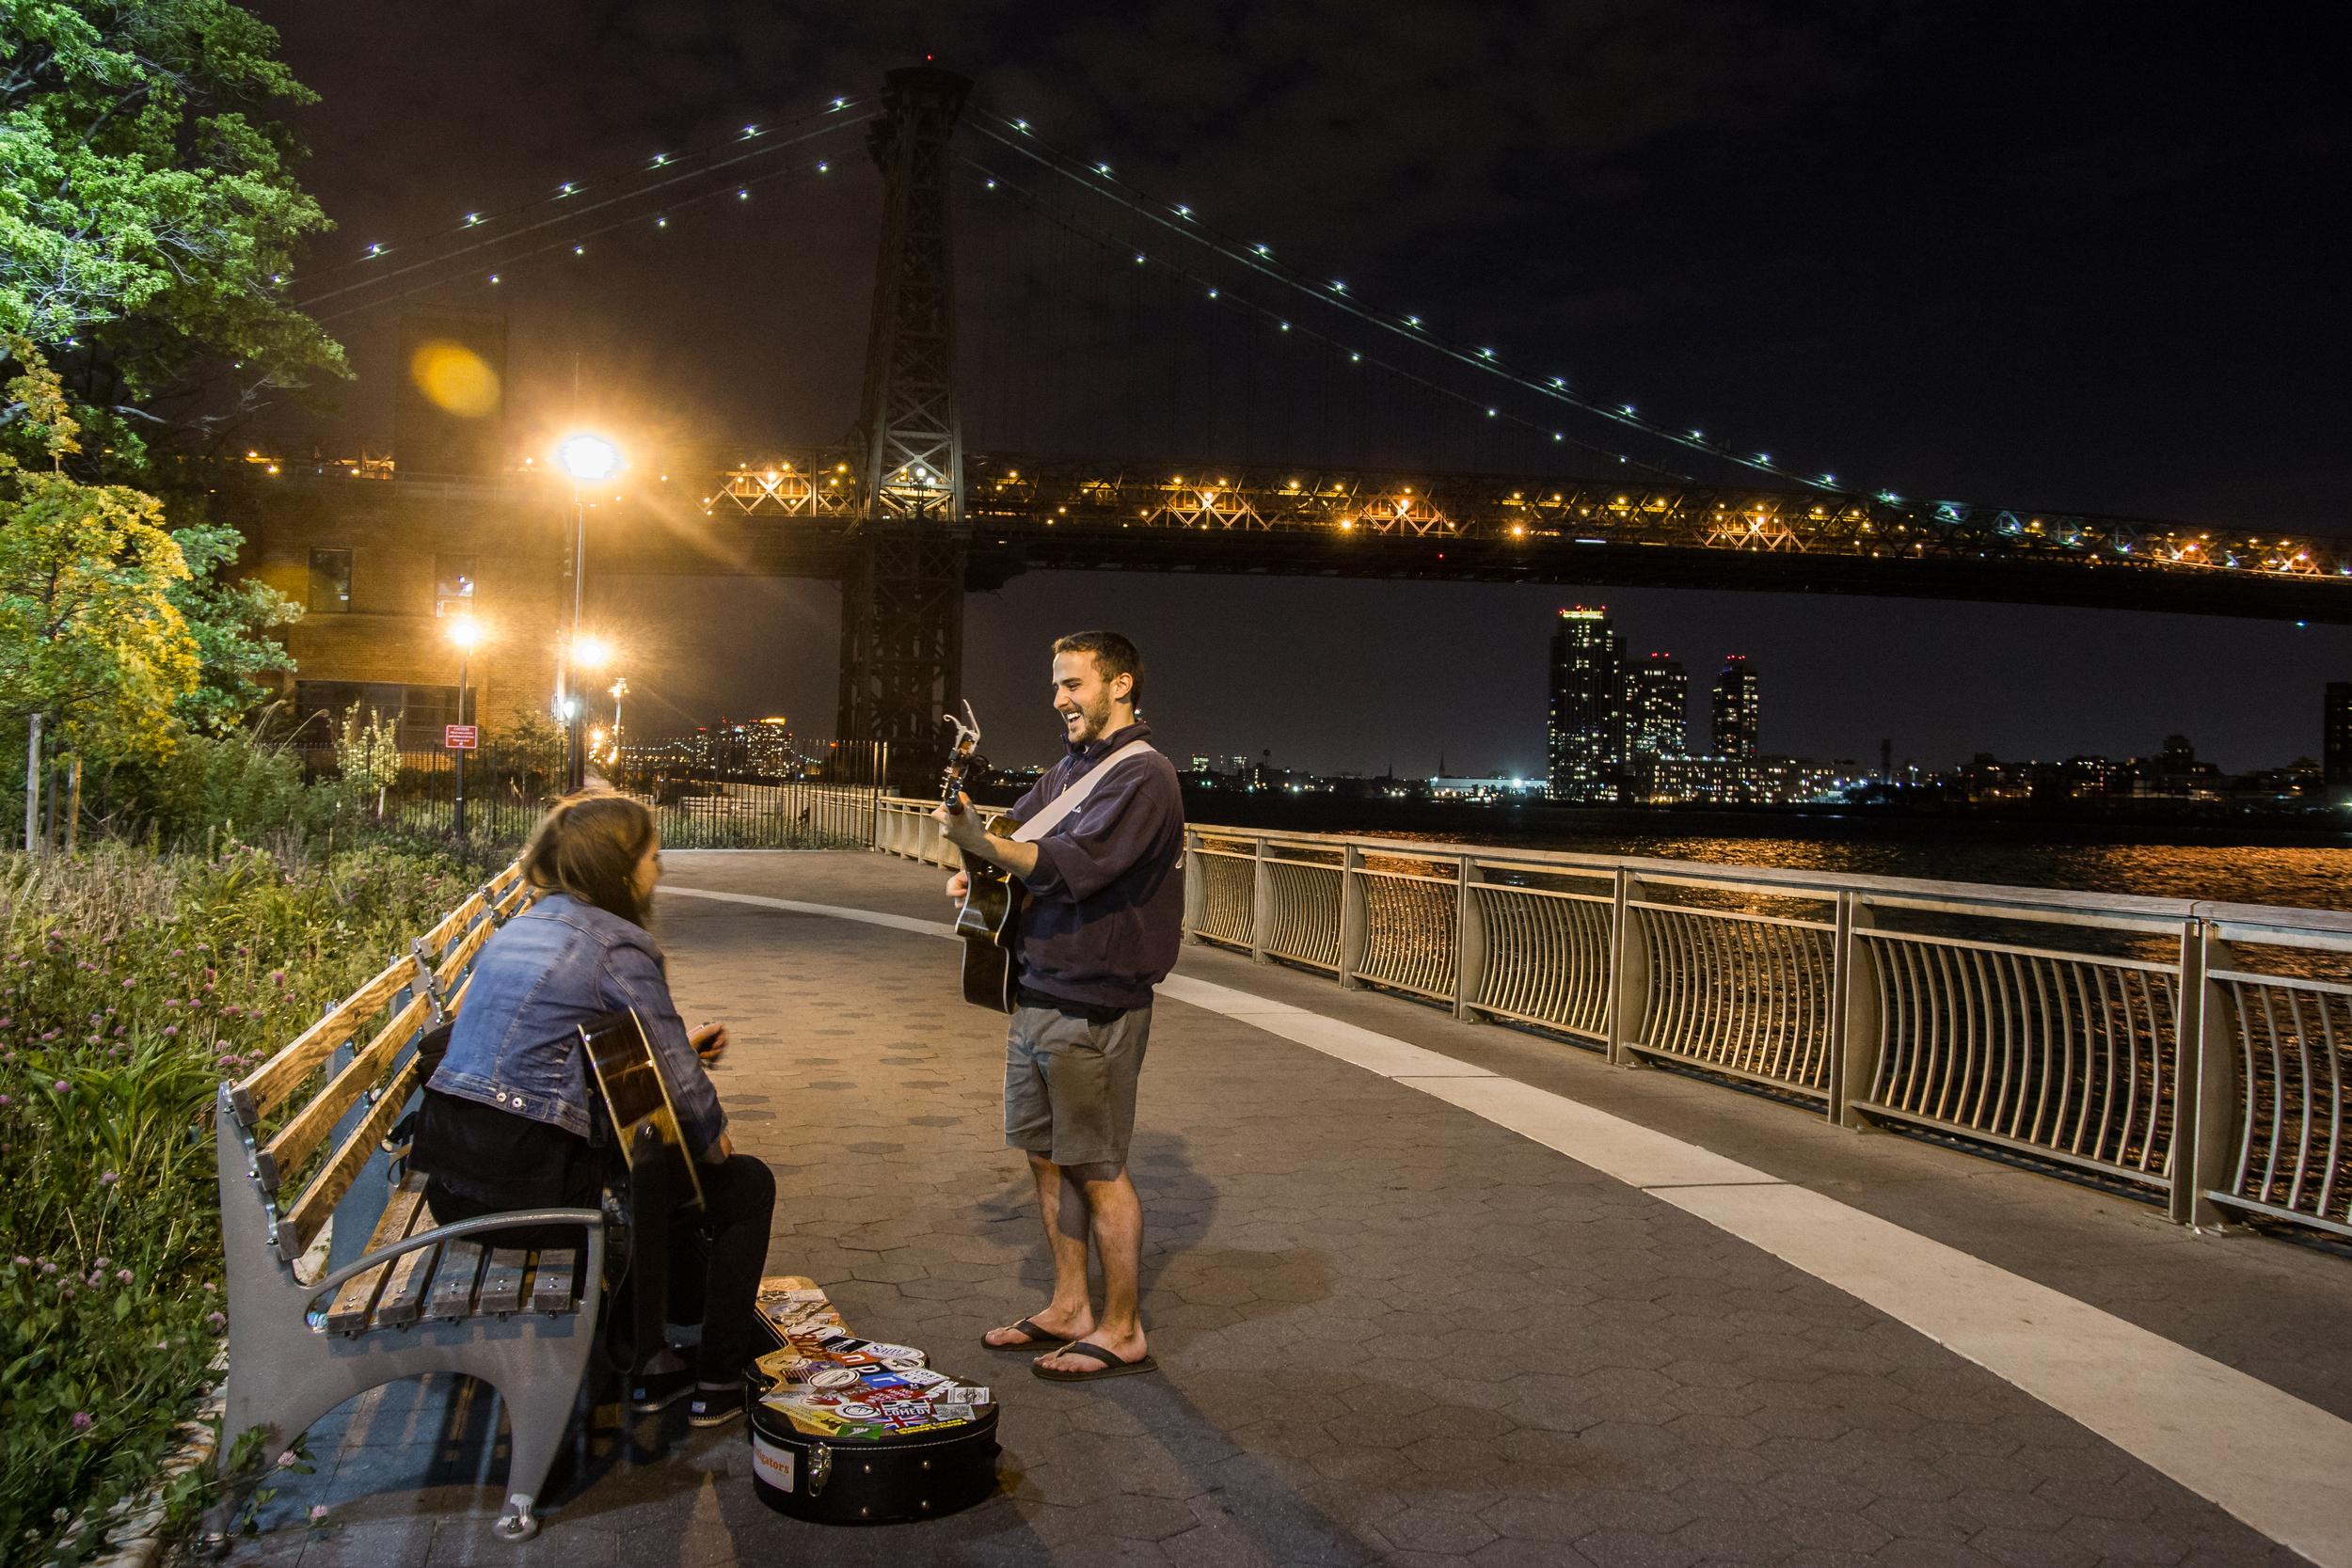 20150525 East River Night Shoot-1.jpg